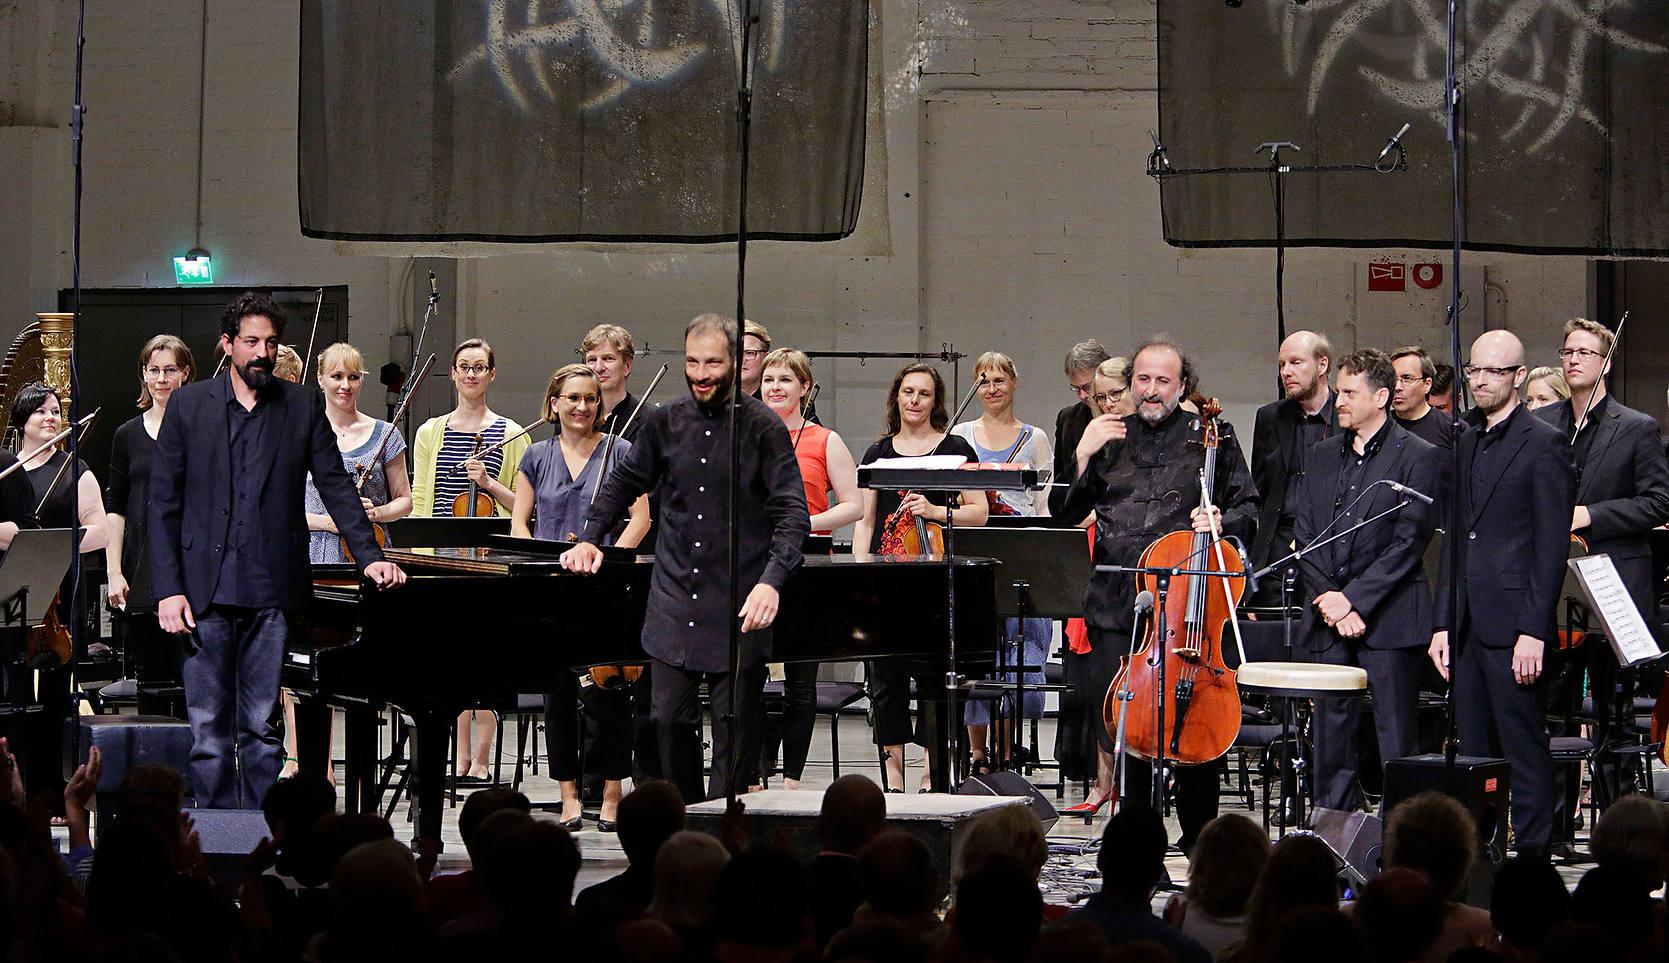 Camerata Flamenco Project y la Avanti Chamber orchestra en el Avanti festival